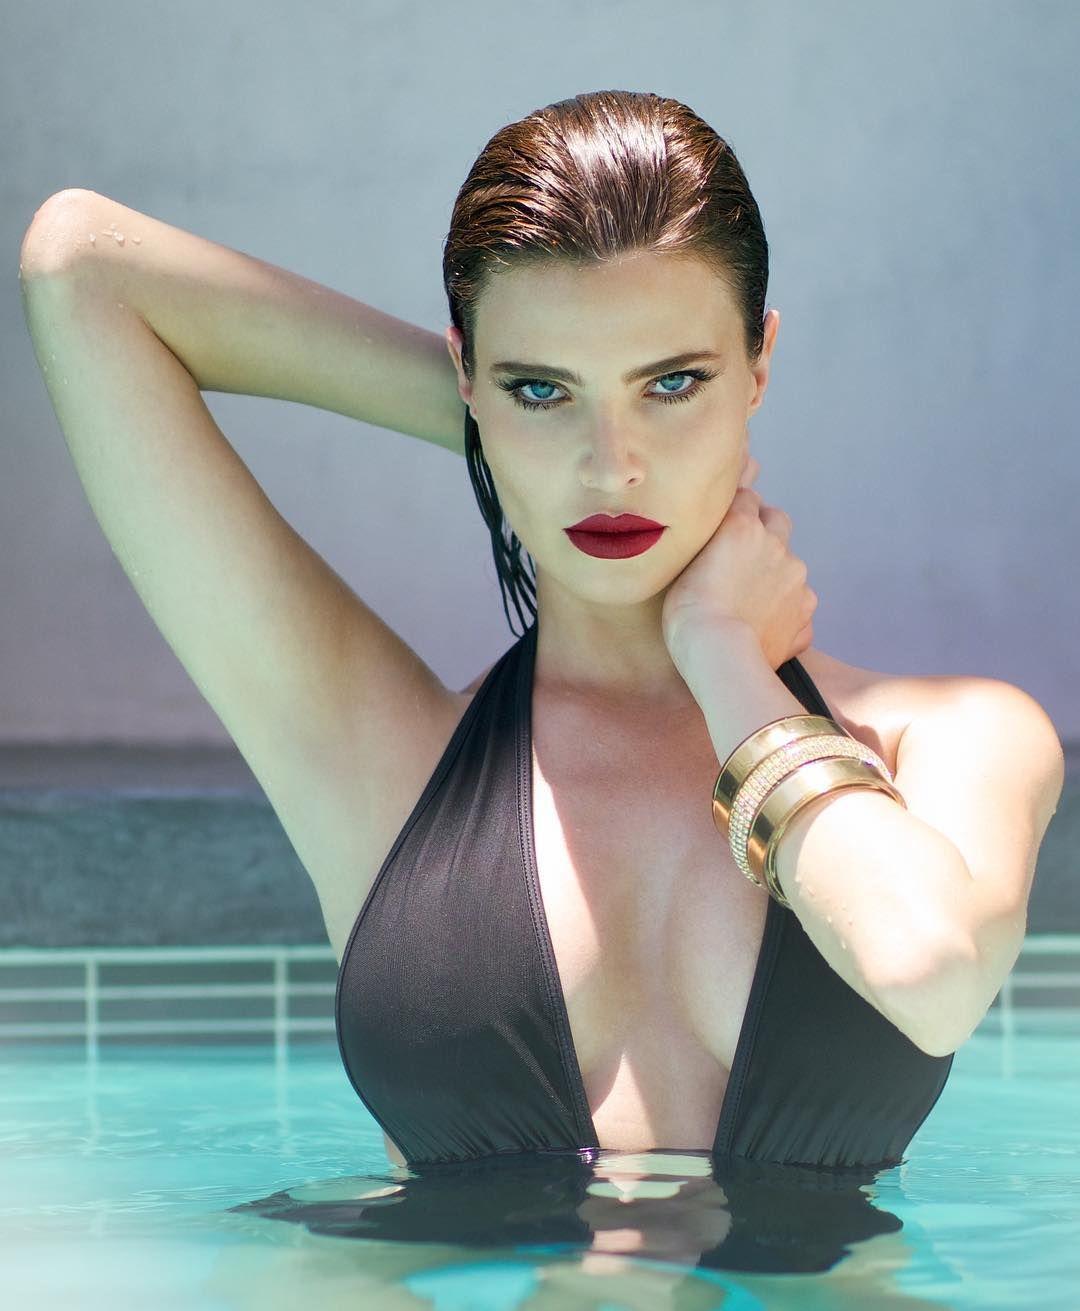 Video Julia Lescova naked (78 photos), Tits, Paparazzi, Selfie, panties 2020